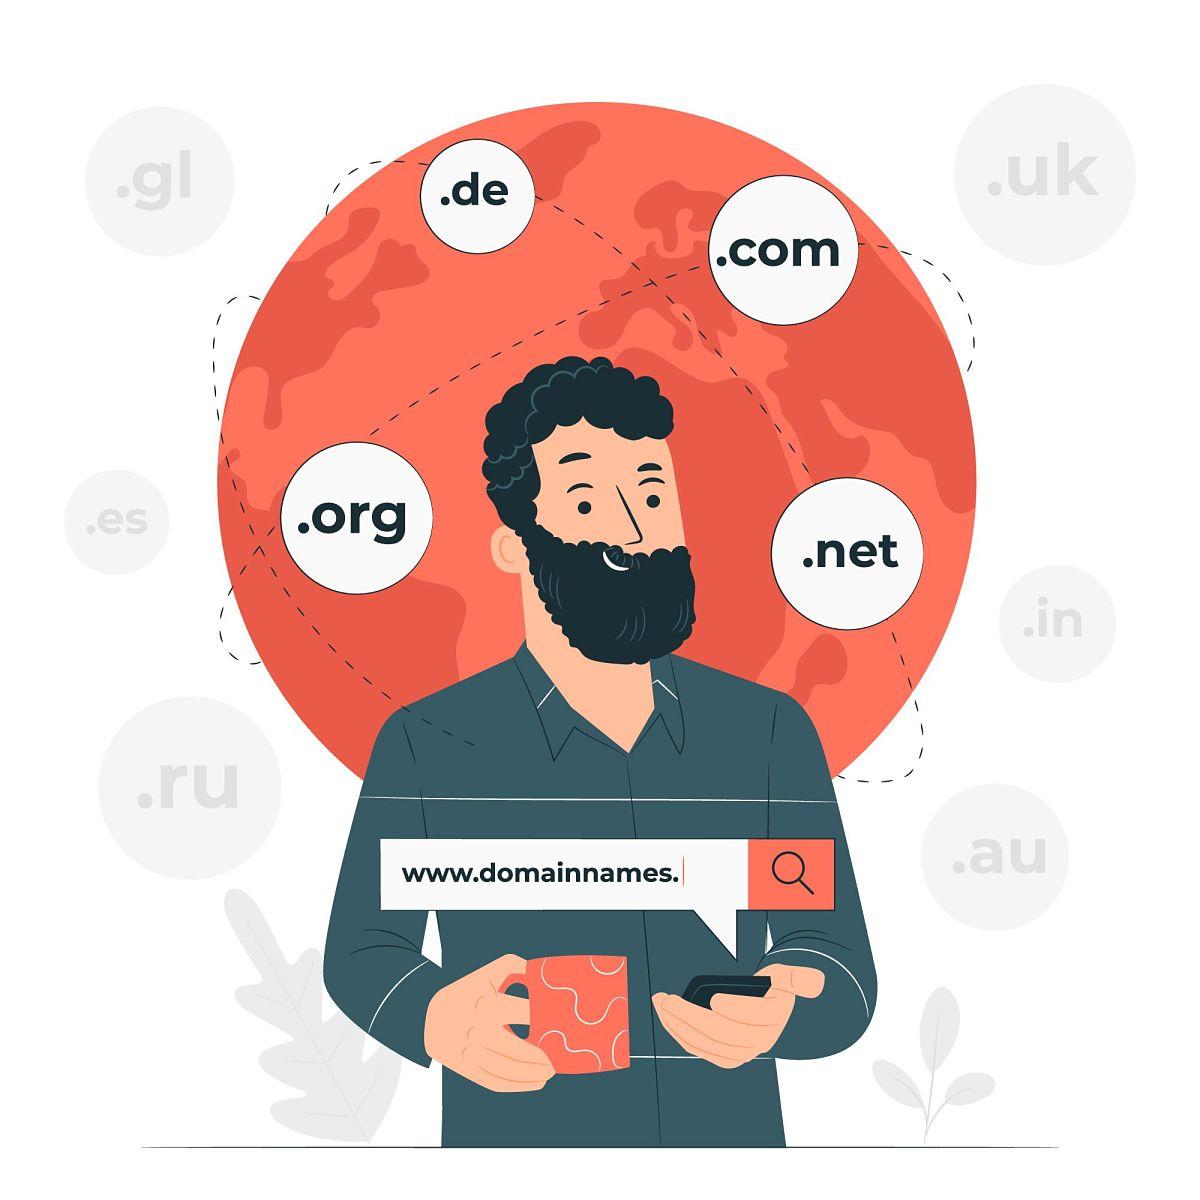 seleccionar nombre de dominio .com, .org, .net